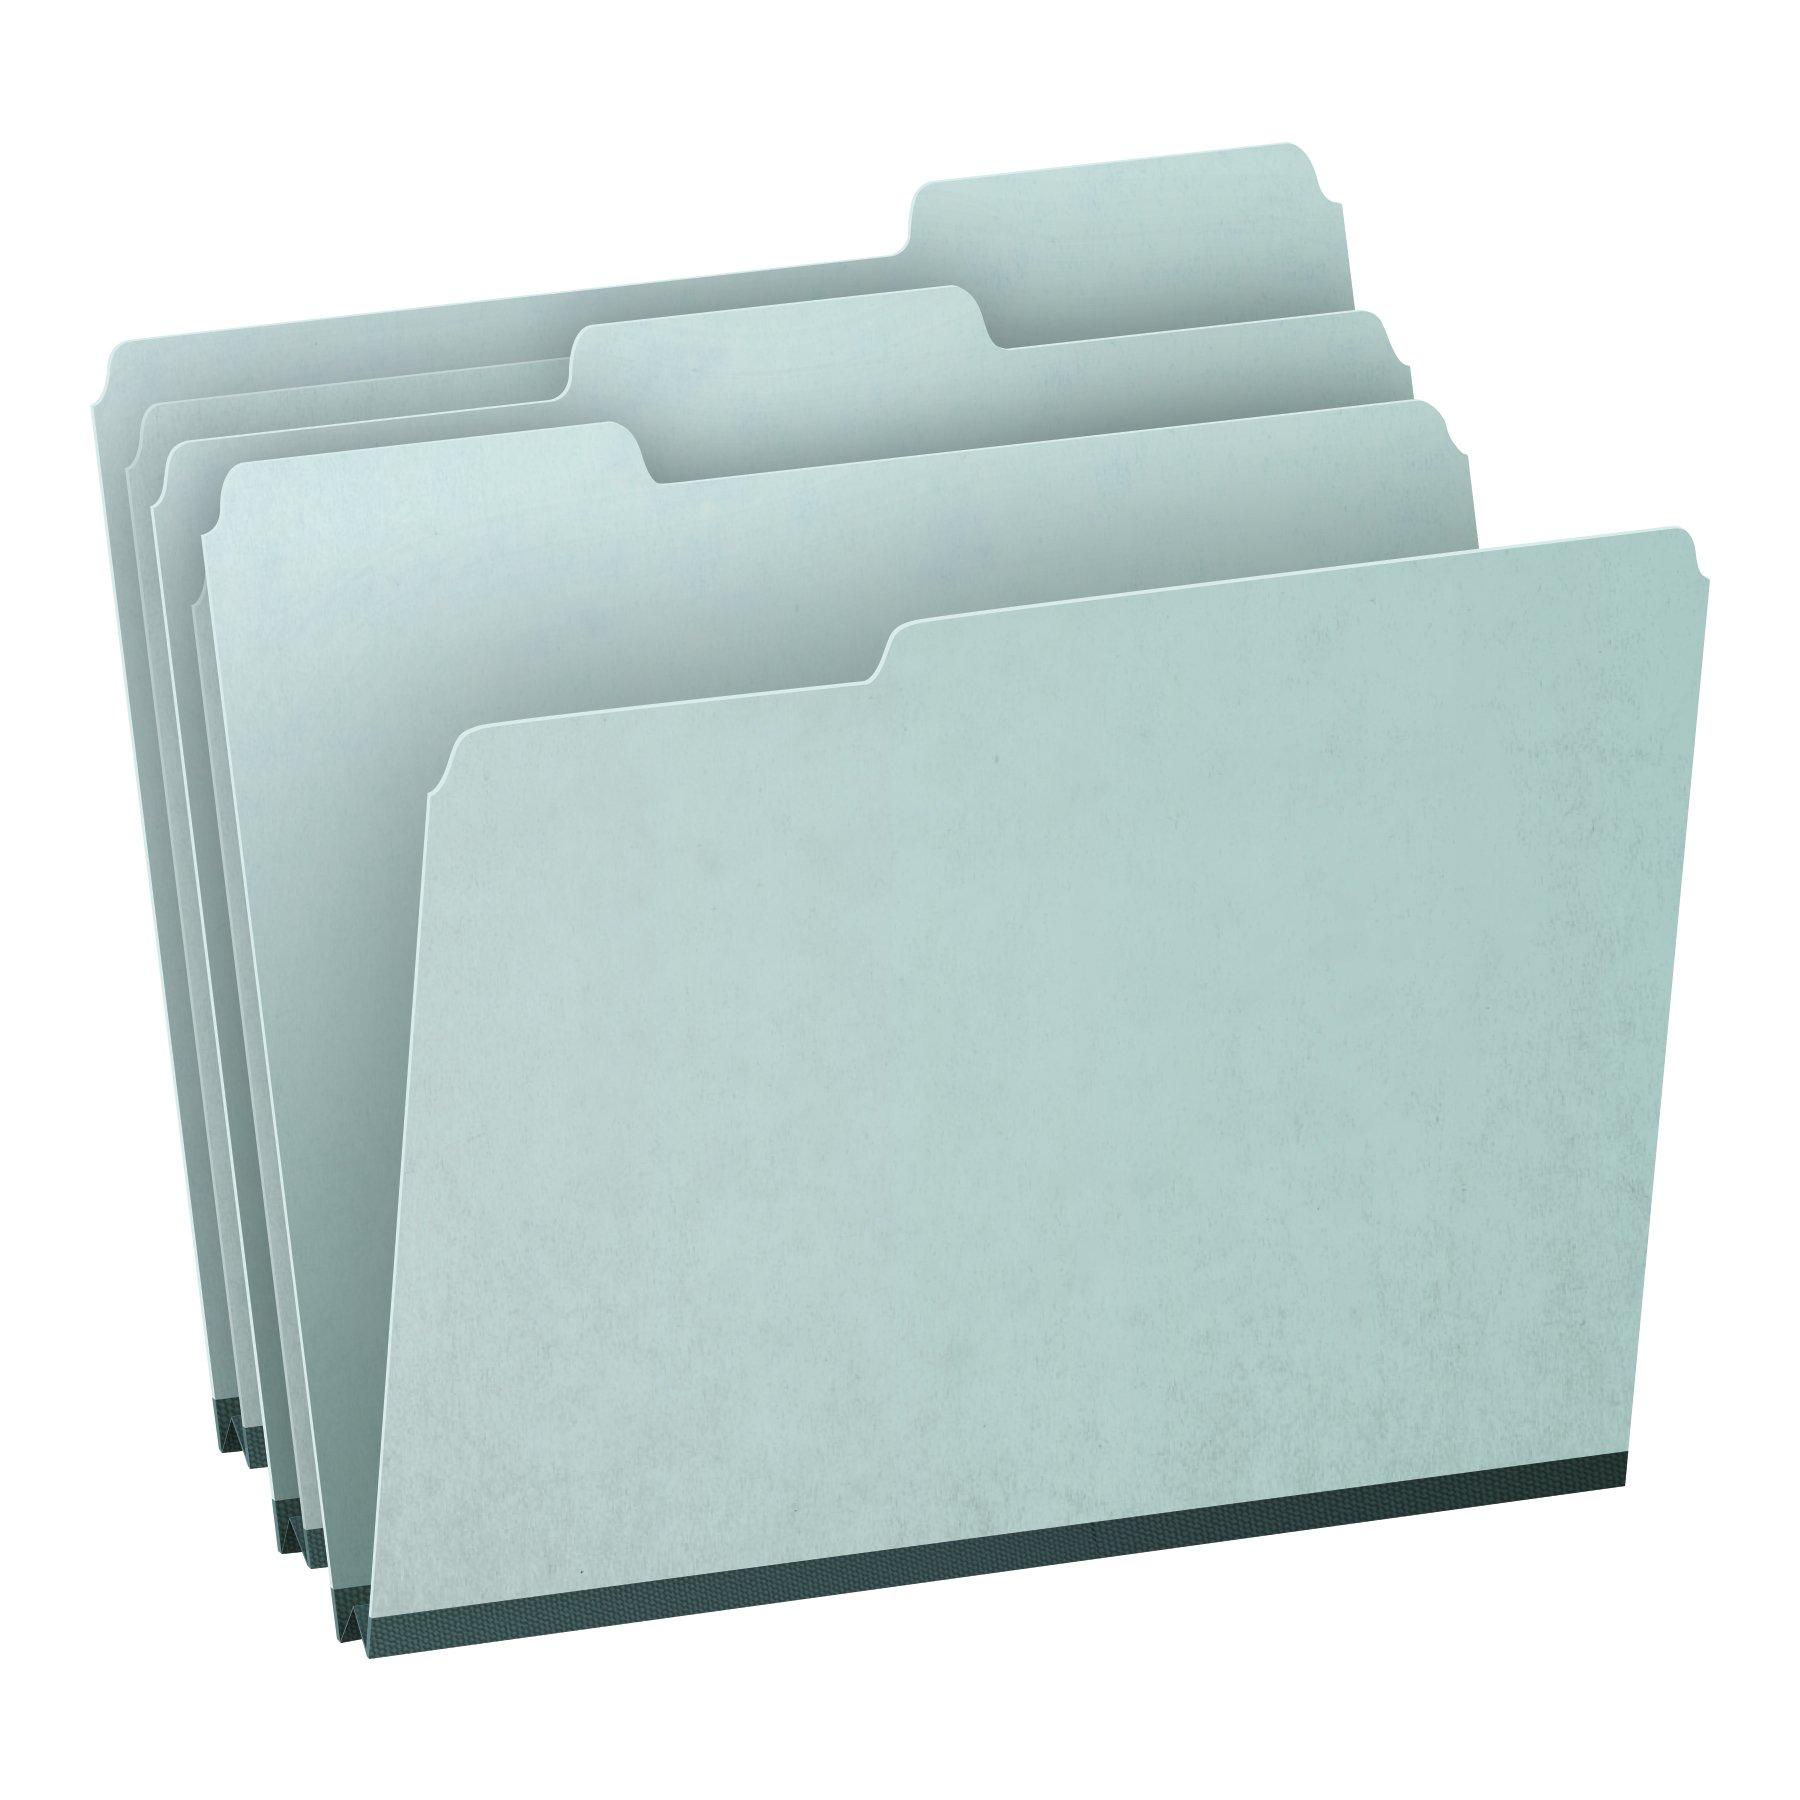 Pendaflex 1'' Expansion Pressboard File Folders with 1/3 Cut Tab, Letter, Blue, 25/Box (9200T 1/3) by Pendaflex